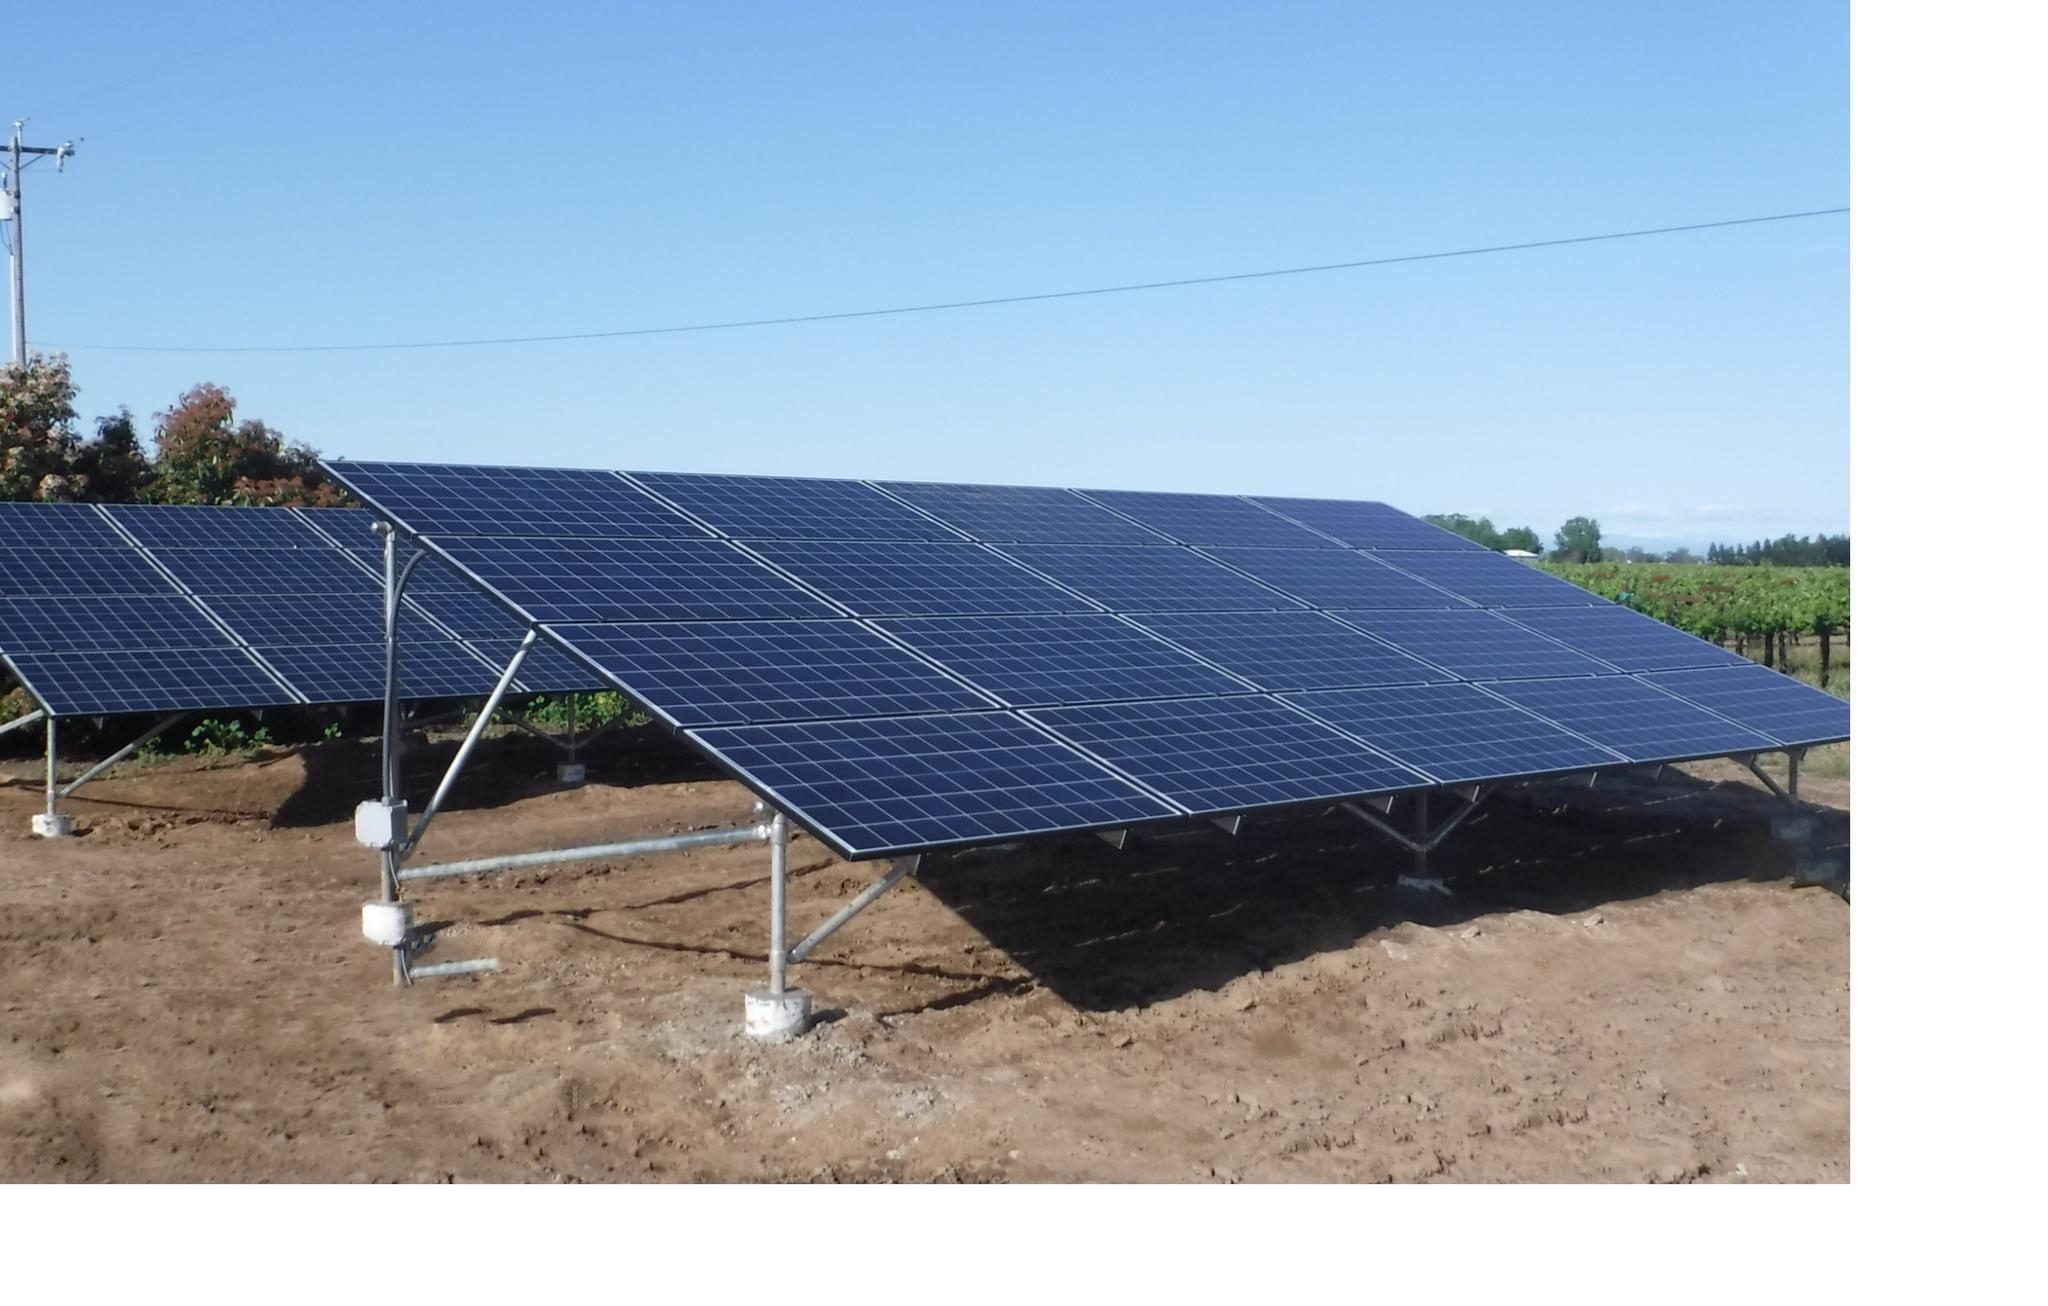 Kurios Energy Profile Amp Reviews 2018 Energysage